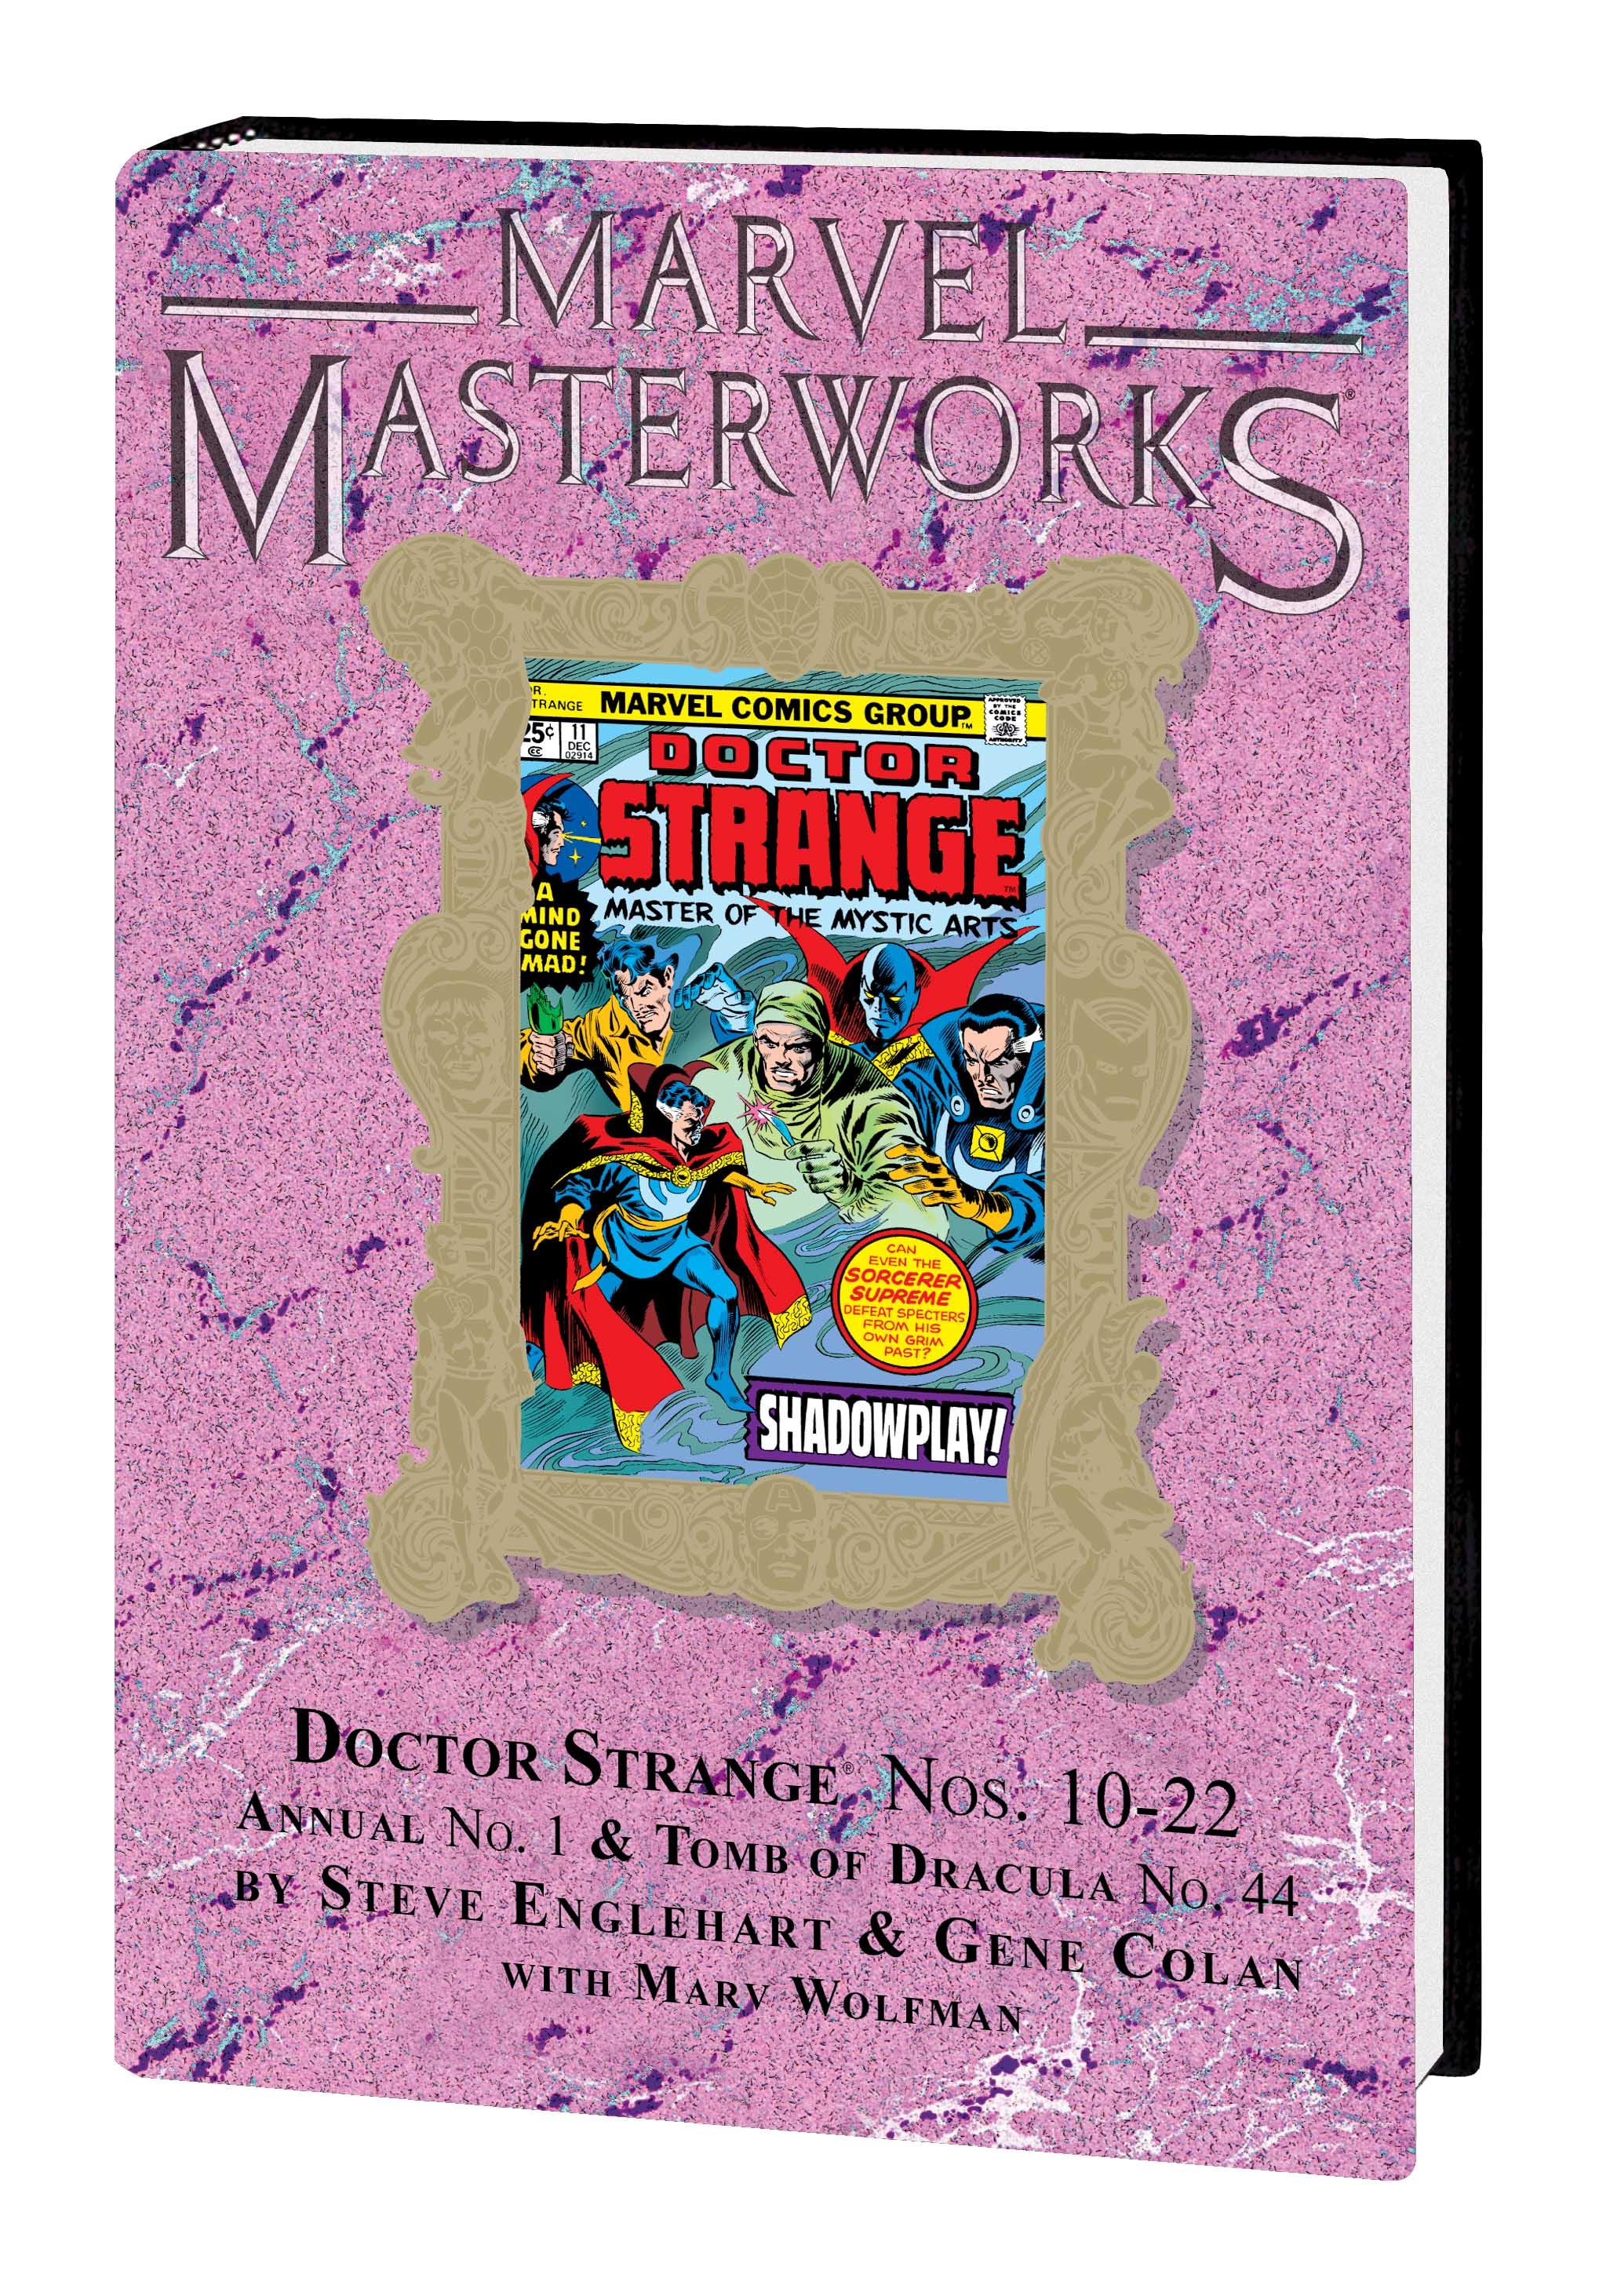 MARVEL MASTERWORKS: DOCTOR STRANGE VOL. 6 HC VARIANT (DM ONLY) (Hardcover)